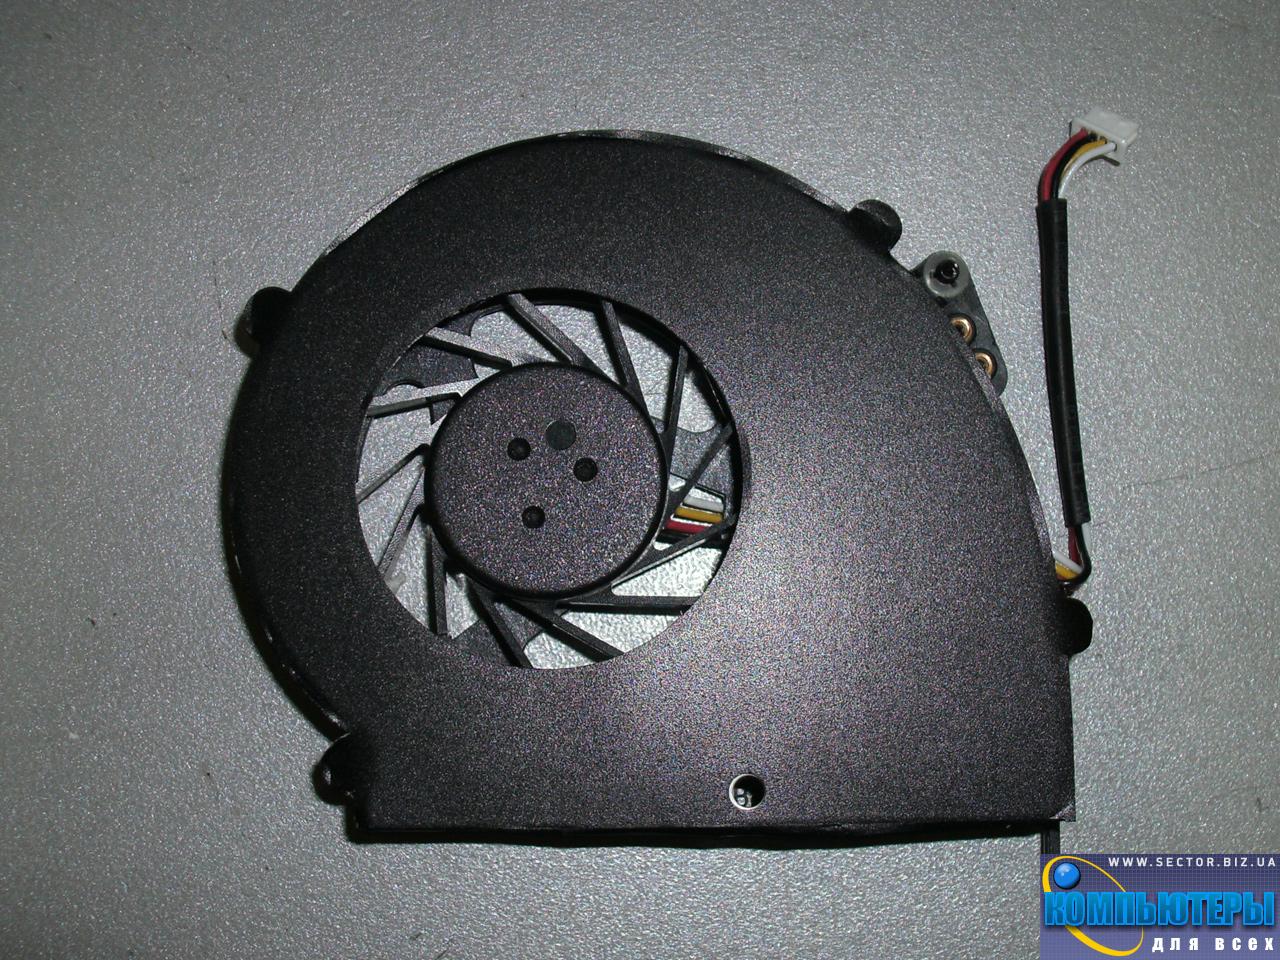 Кулер к ноутбуку Acer Extensa 5235 5635 5635G 5635Z 5635ZG ZR6 p/n: AB0805HX-TBB (CWZR6). Фото № 3.